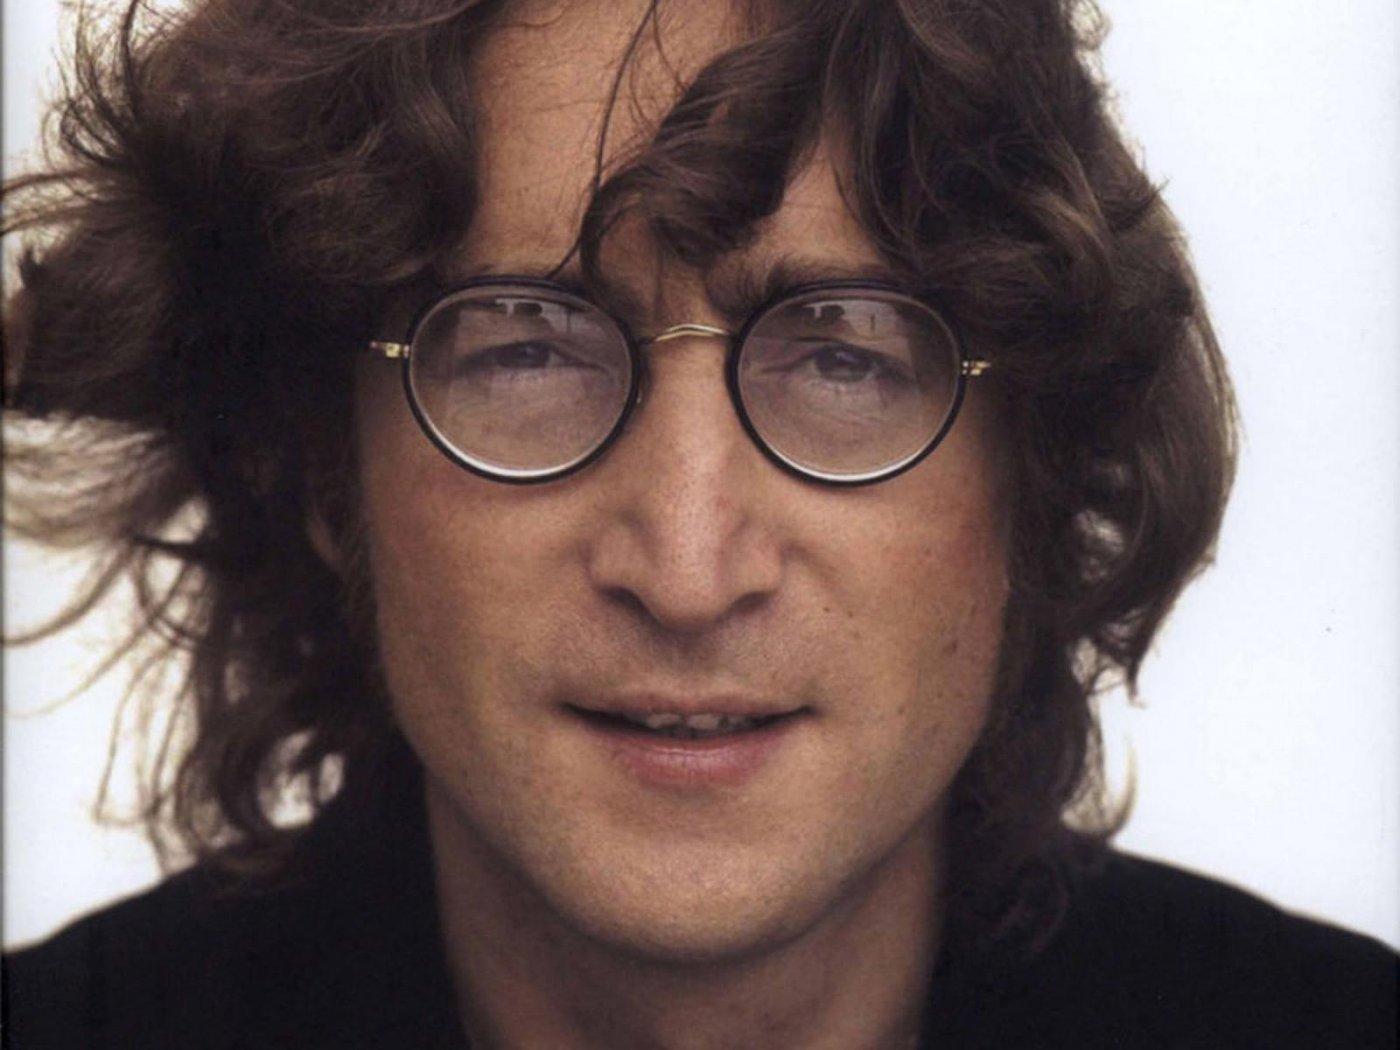 John Lennon Example Image